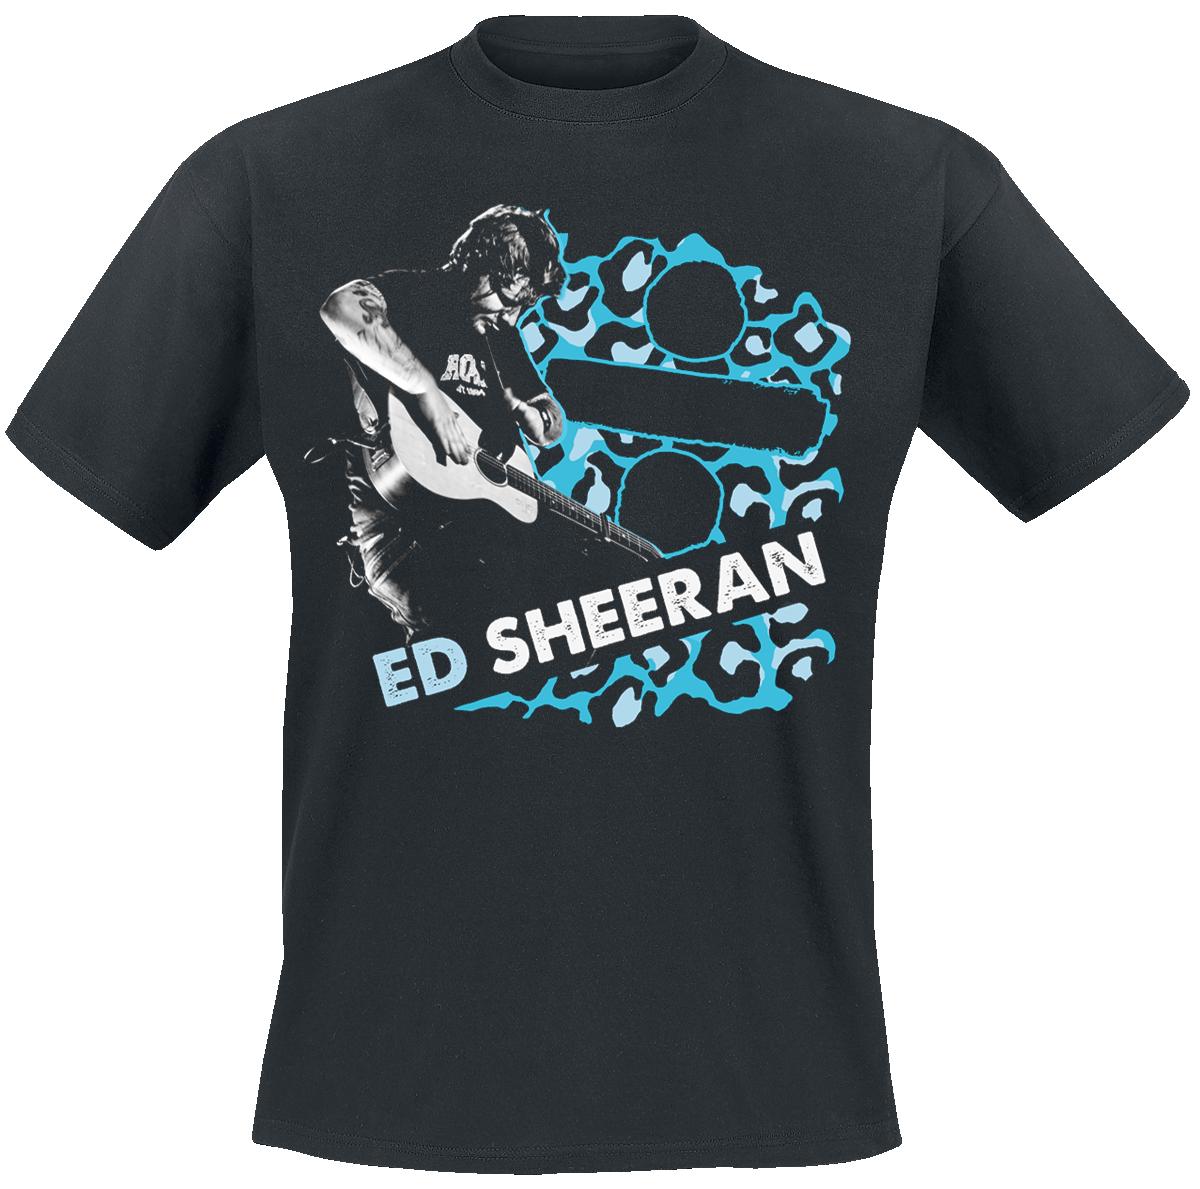 Ed Sheeran - Leopard Live - T-Shirt - black image